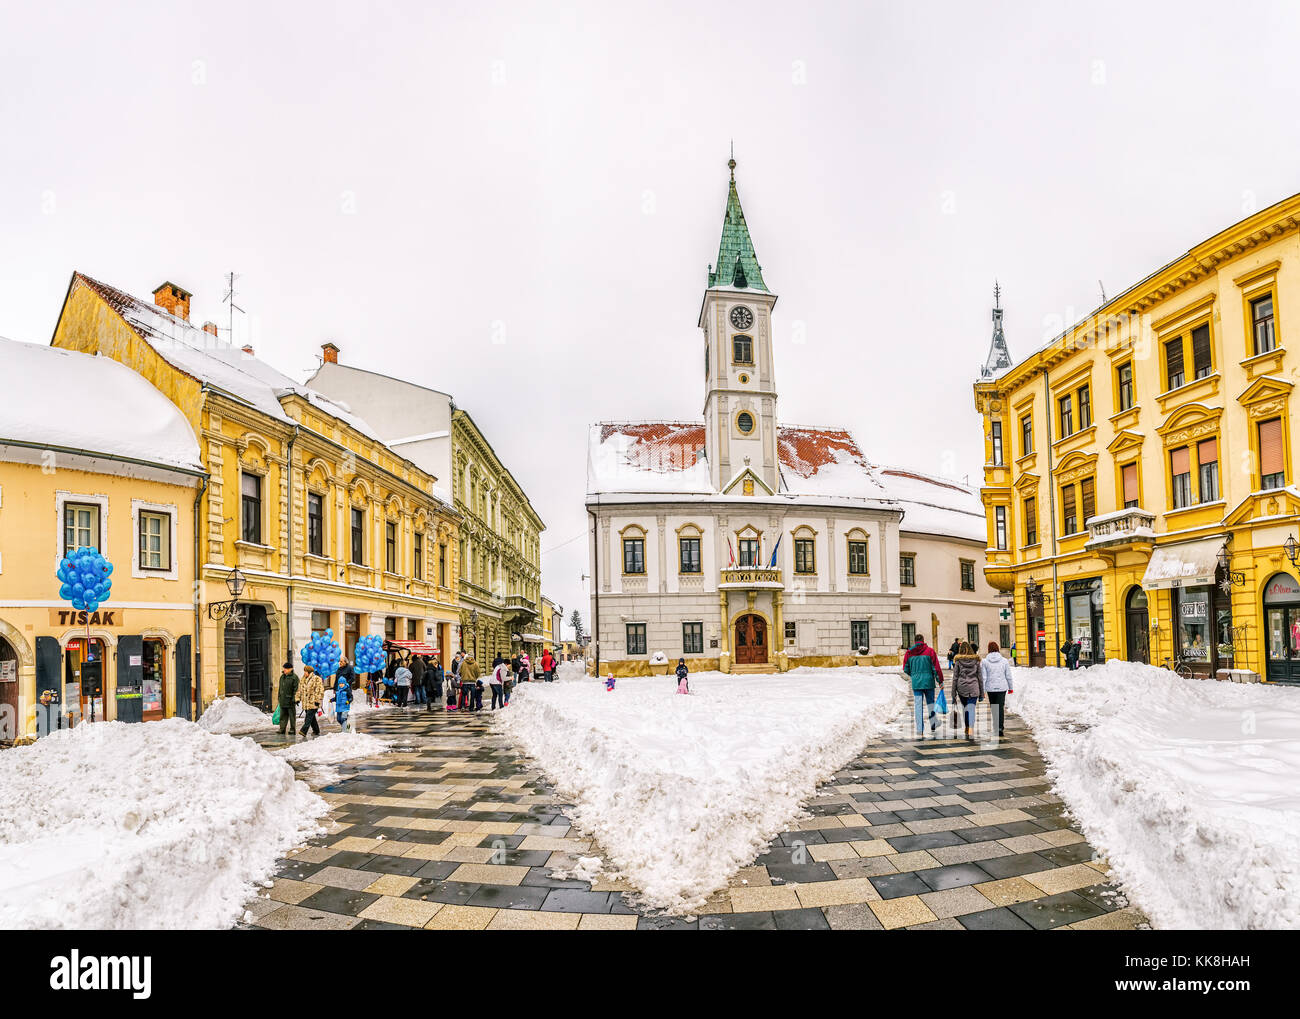 Varazdin main square winter time - Stock Image